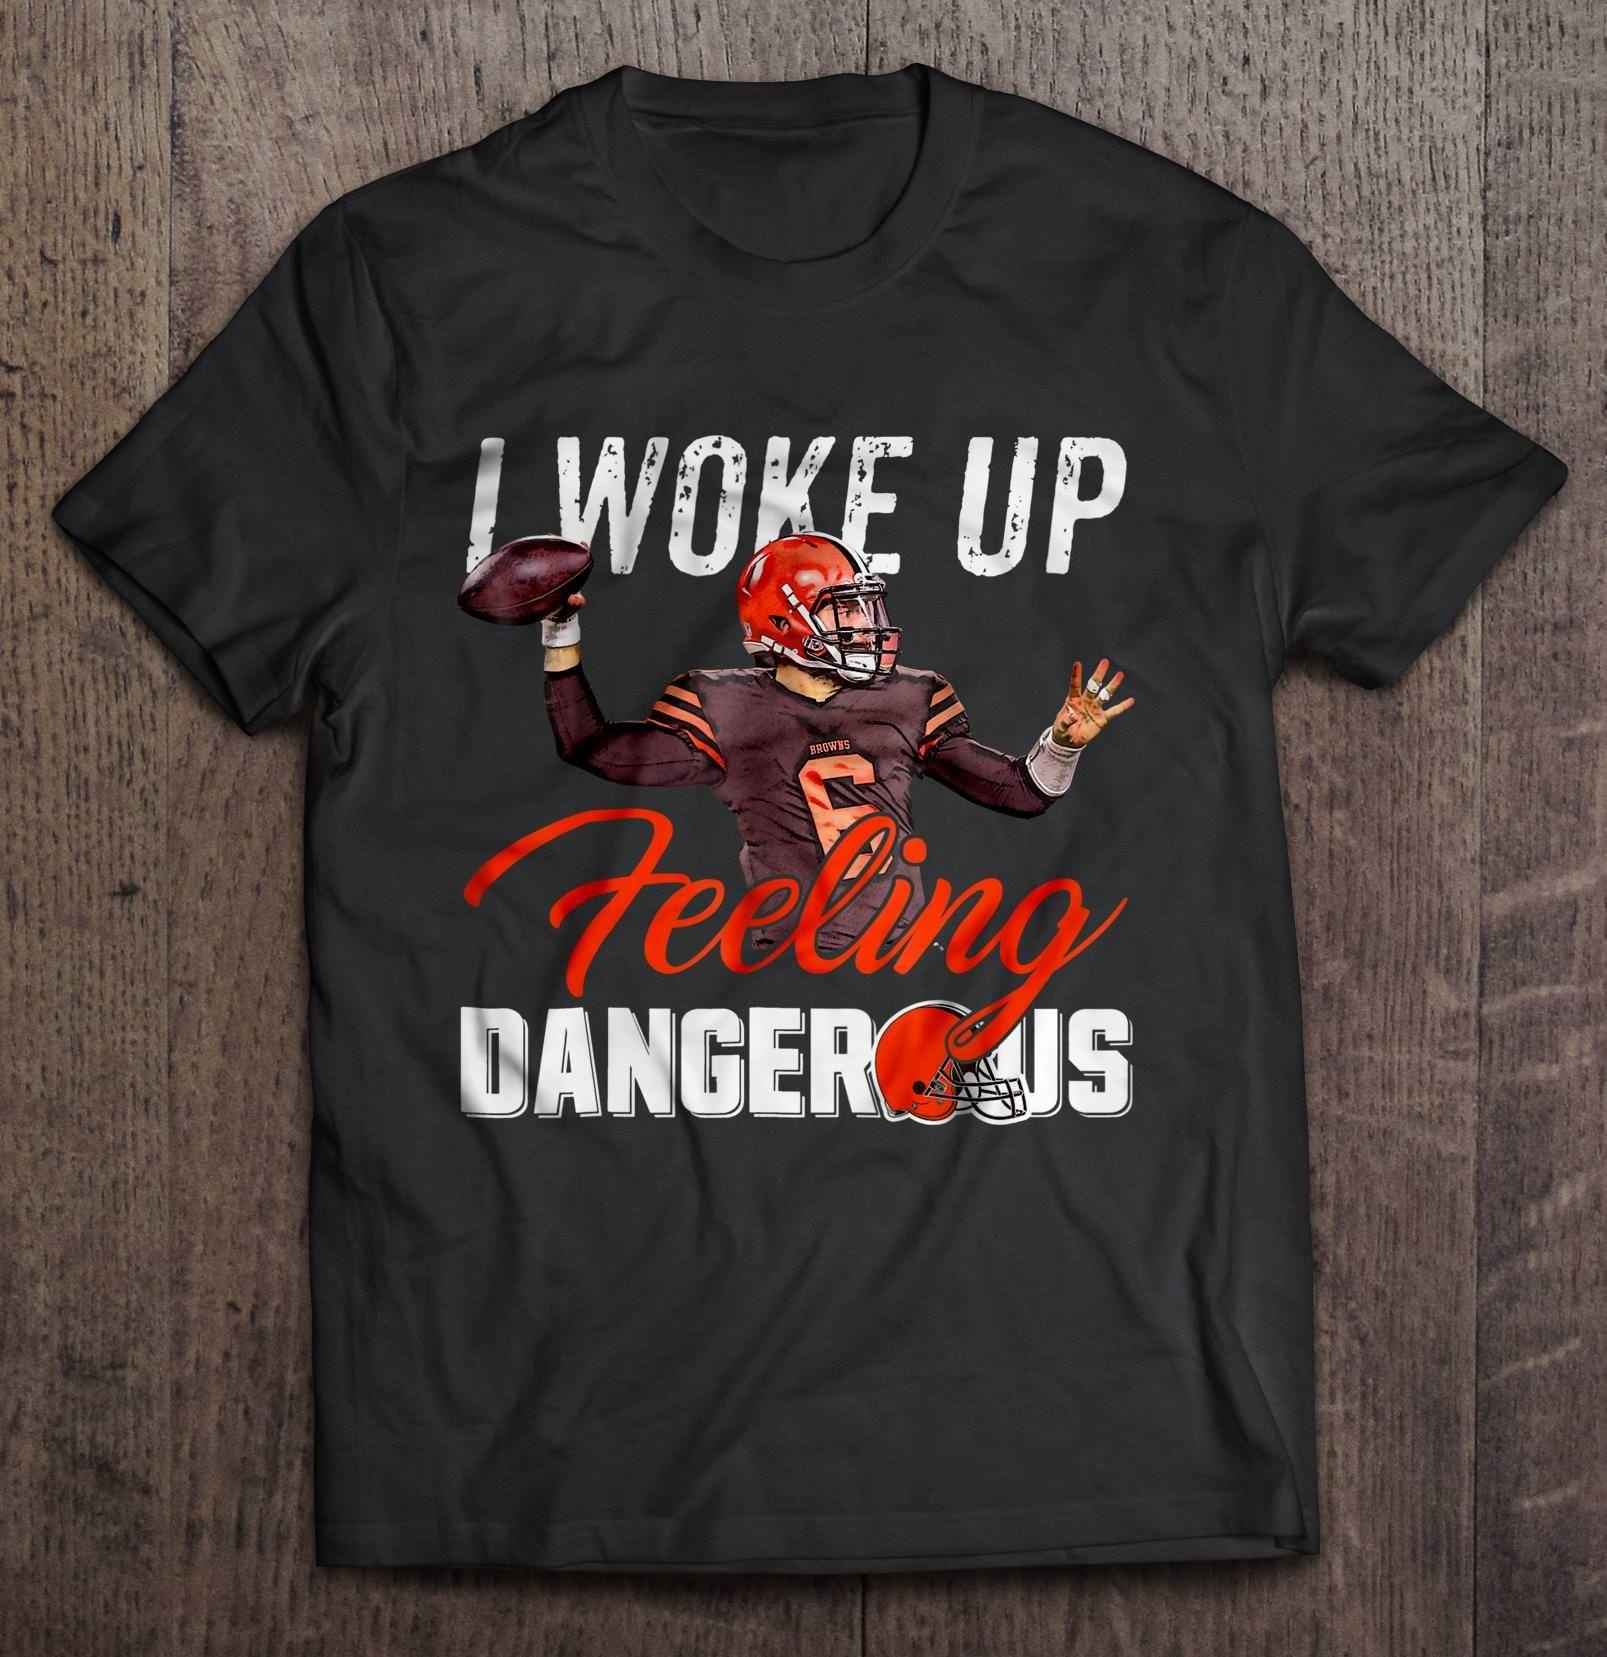 I woke up feeling dangerous baker mayfield shirt Baker